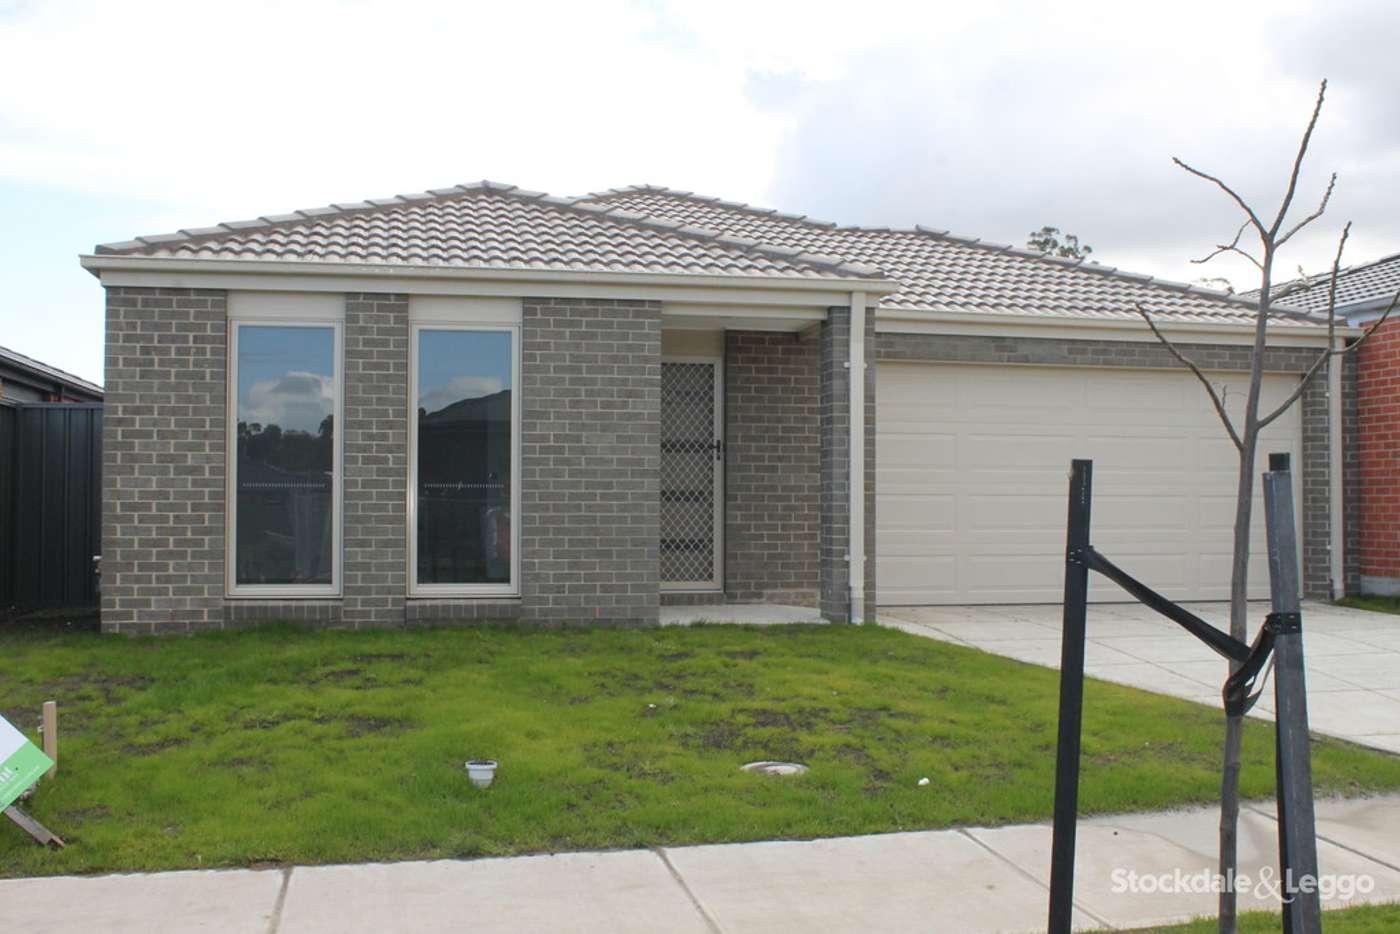 Main view of Homely house listing, 7 Rockies Ridge, Pakenham VIC 3810